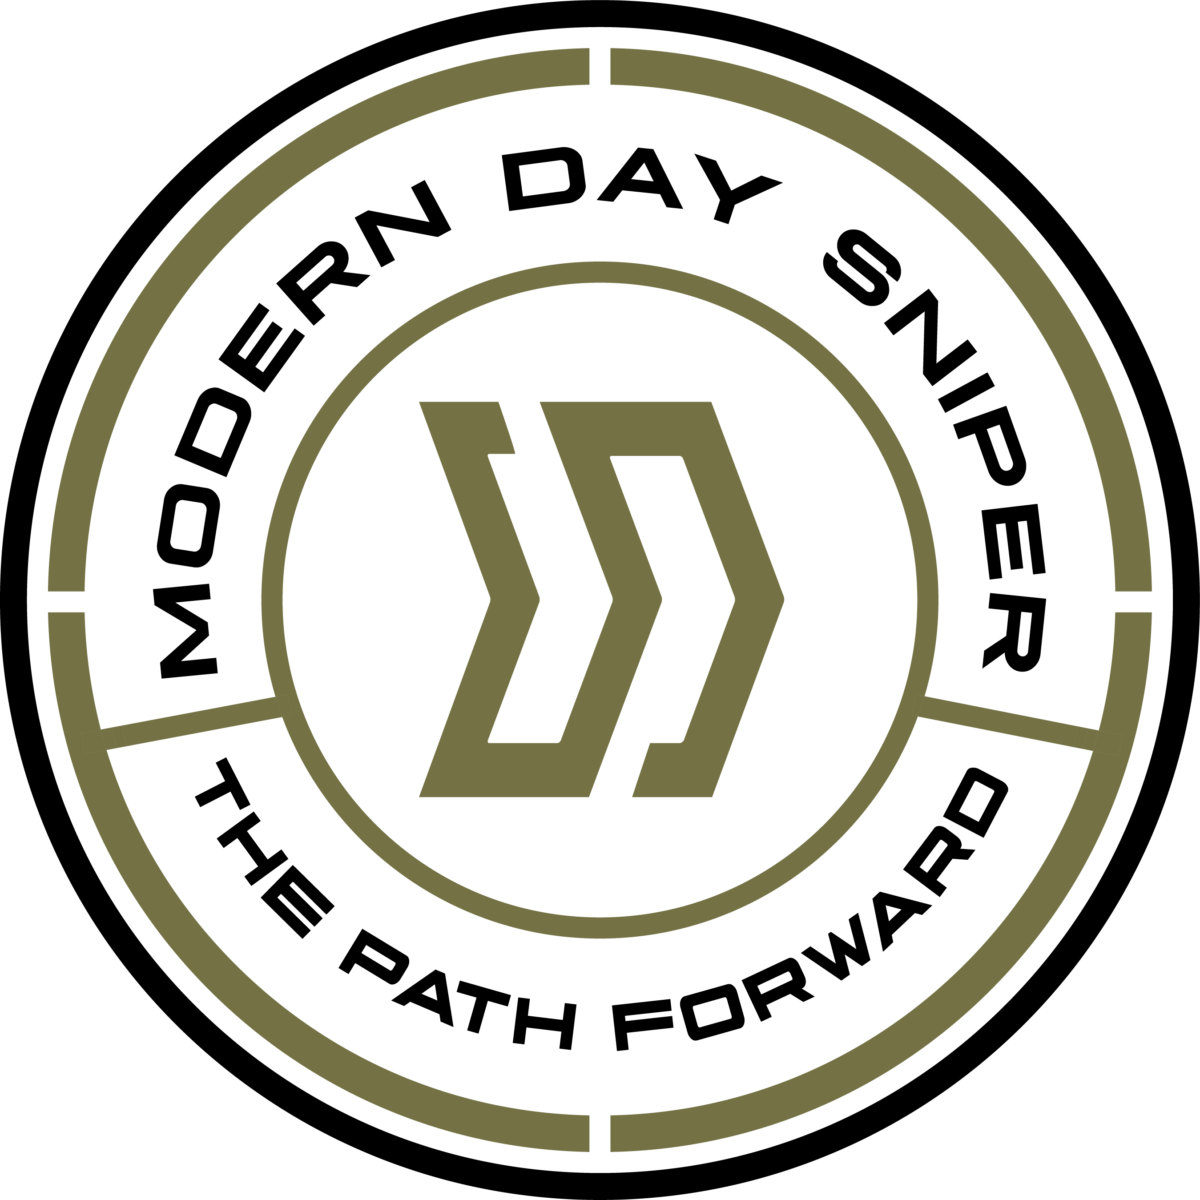 Circle Badge transparent - black